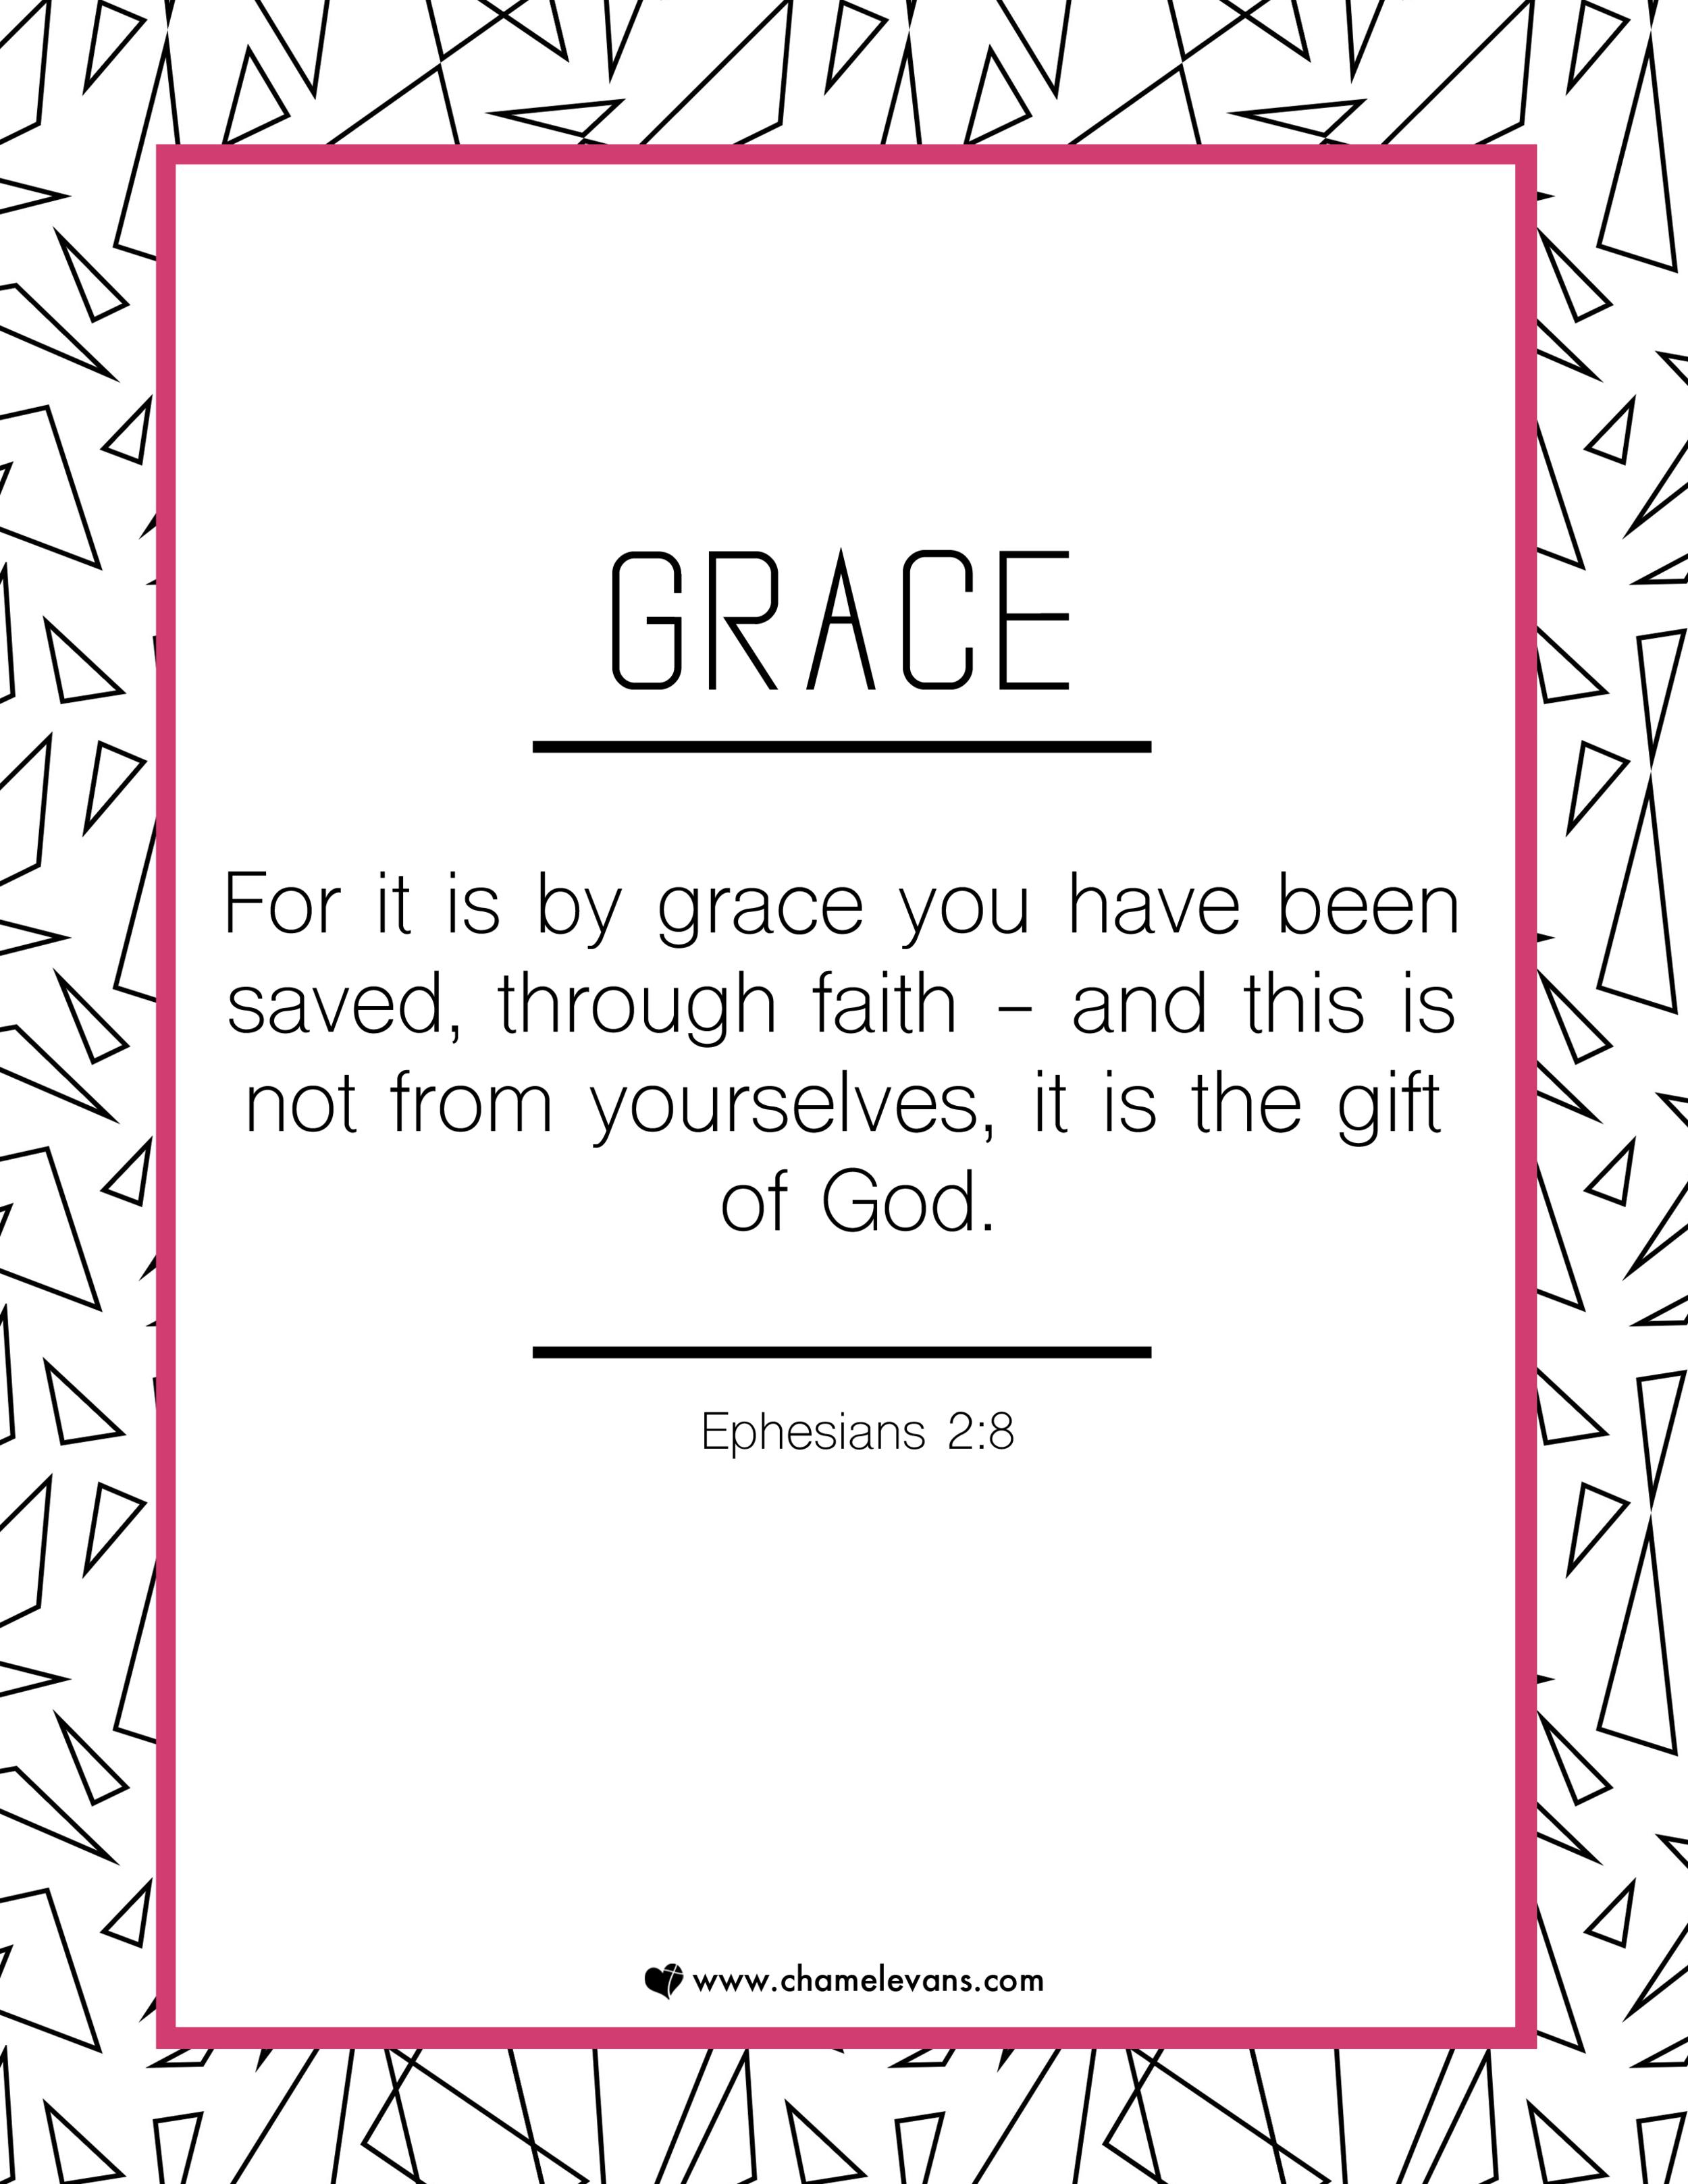 free scripture art printables - grace - stand in God's truth | www.chamelevans.com